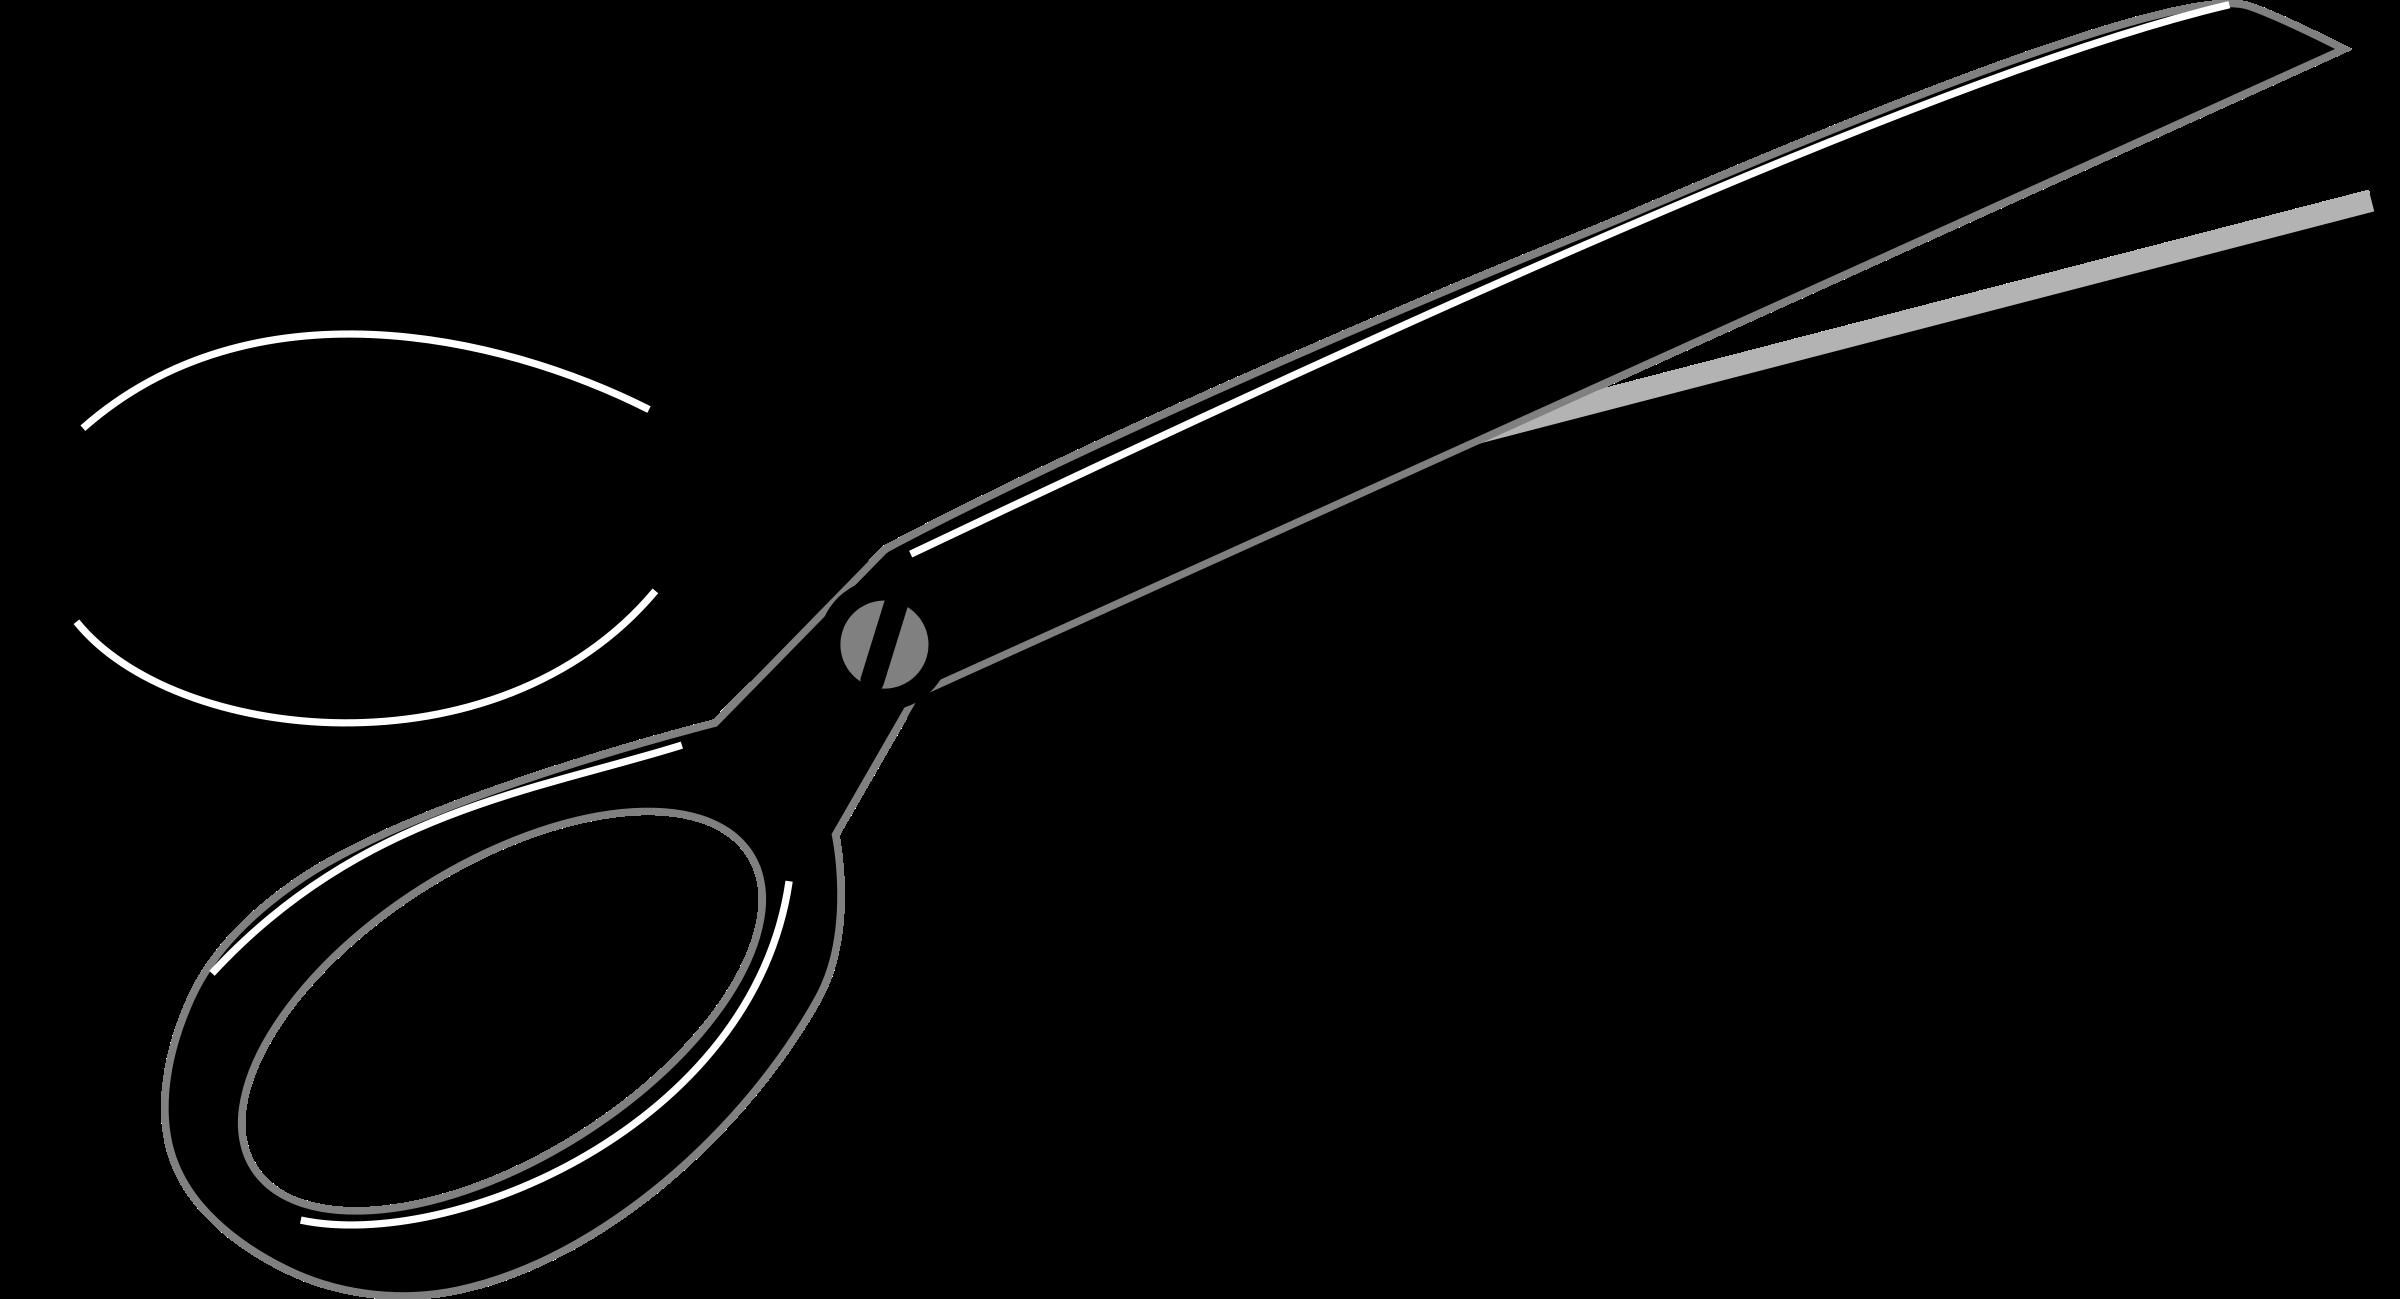 Clipart scissors transparent background. Scissor png images free